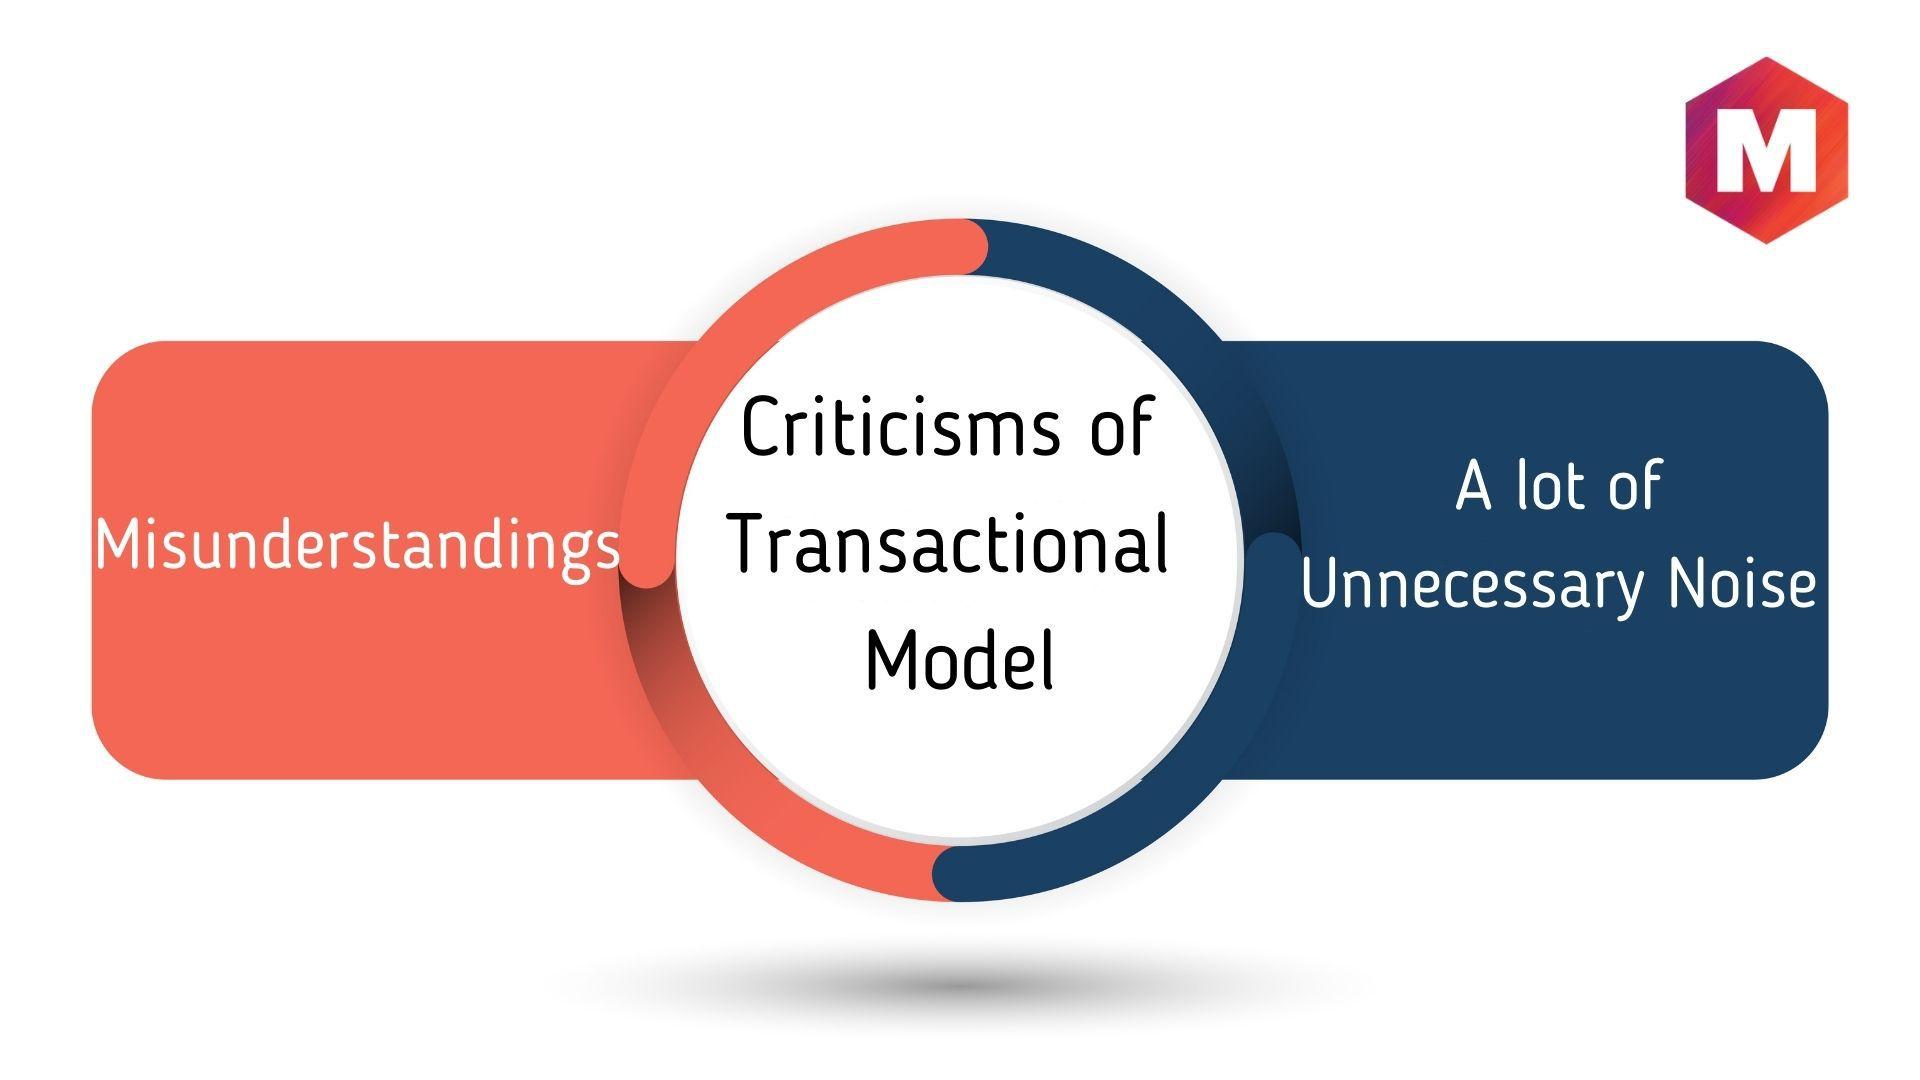 Criticisms of Transactional Model